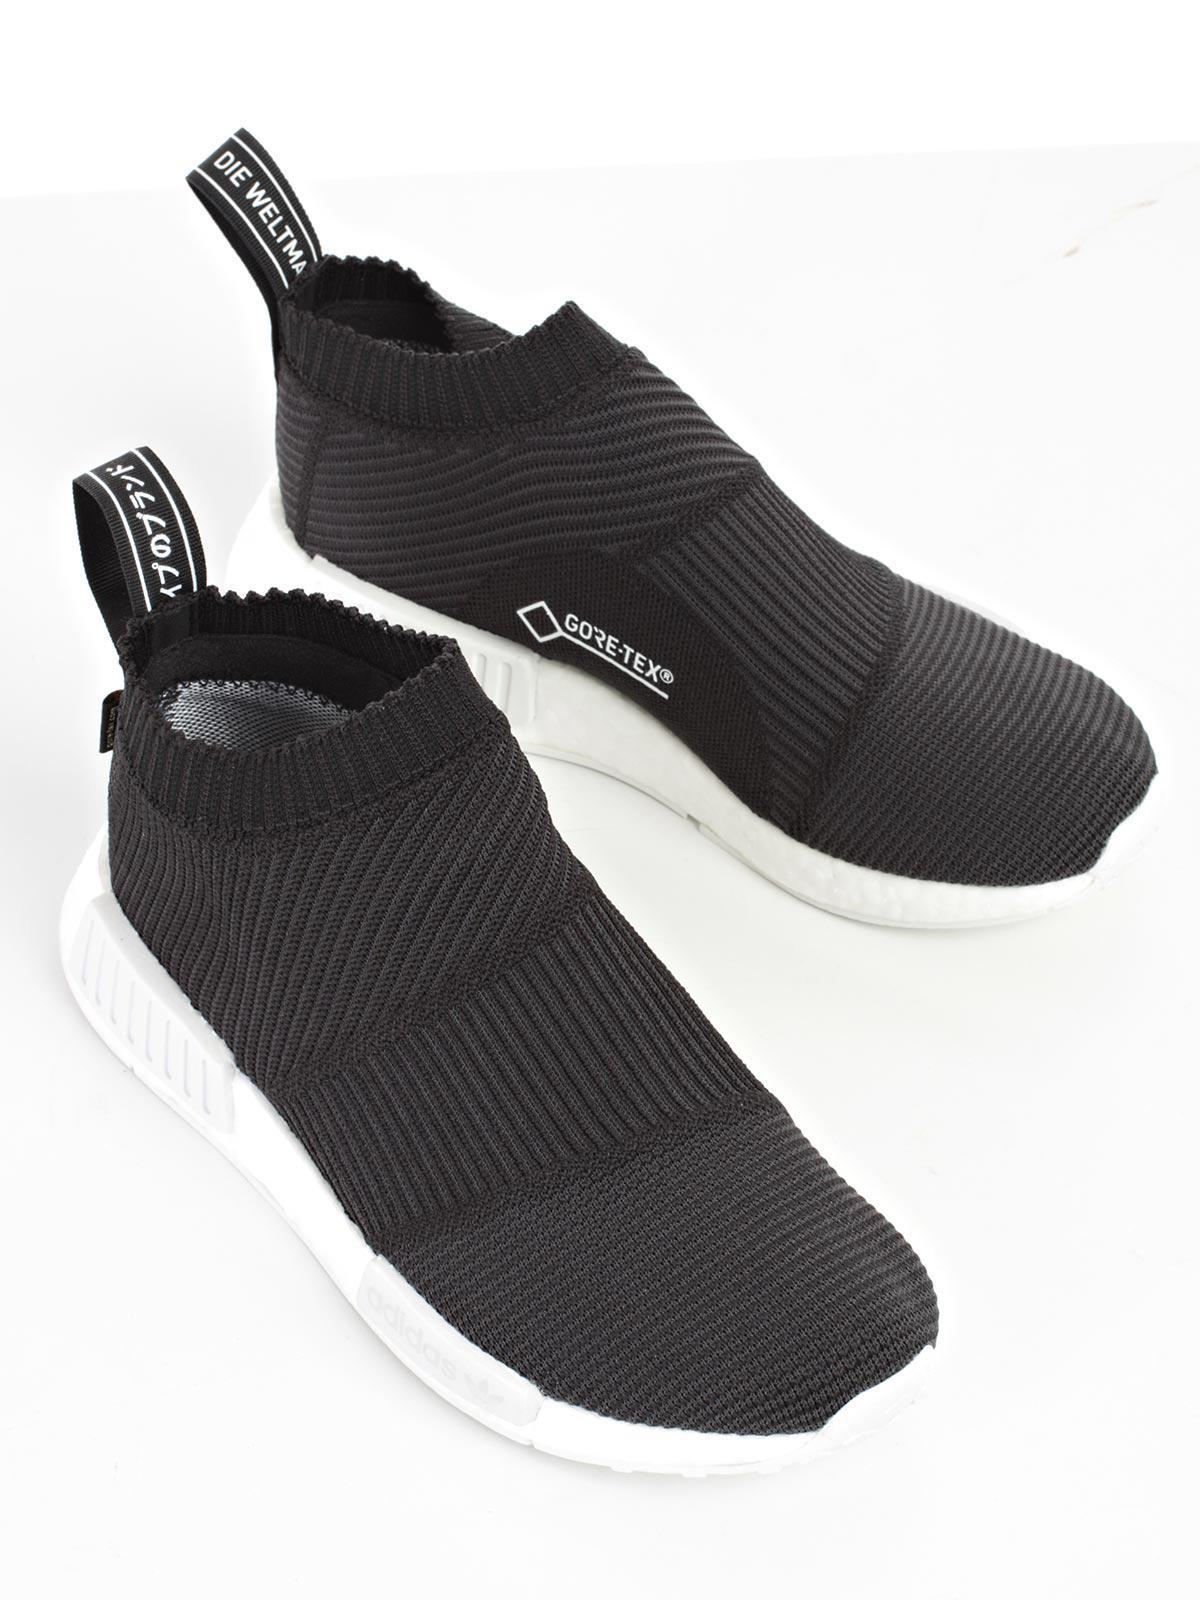 71af7c780 Adidas Originals Scarpa Nmd Cs1 Gtx Pk in Black for Men - Lyst